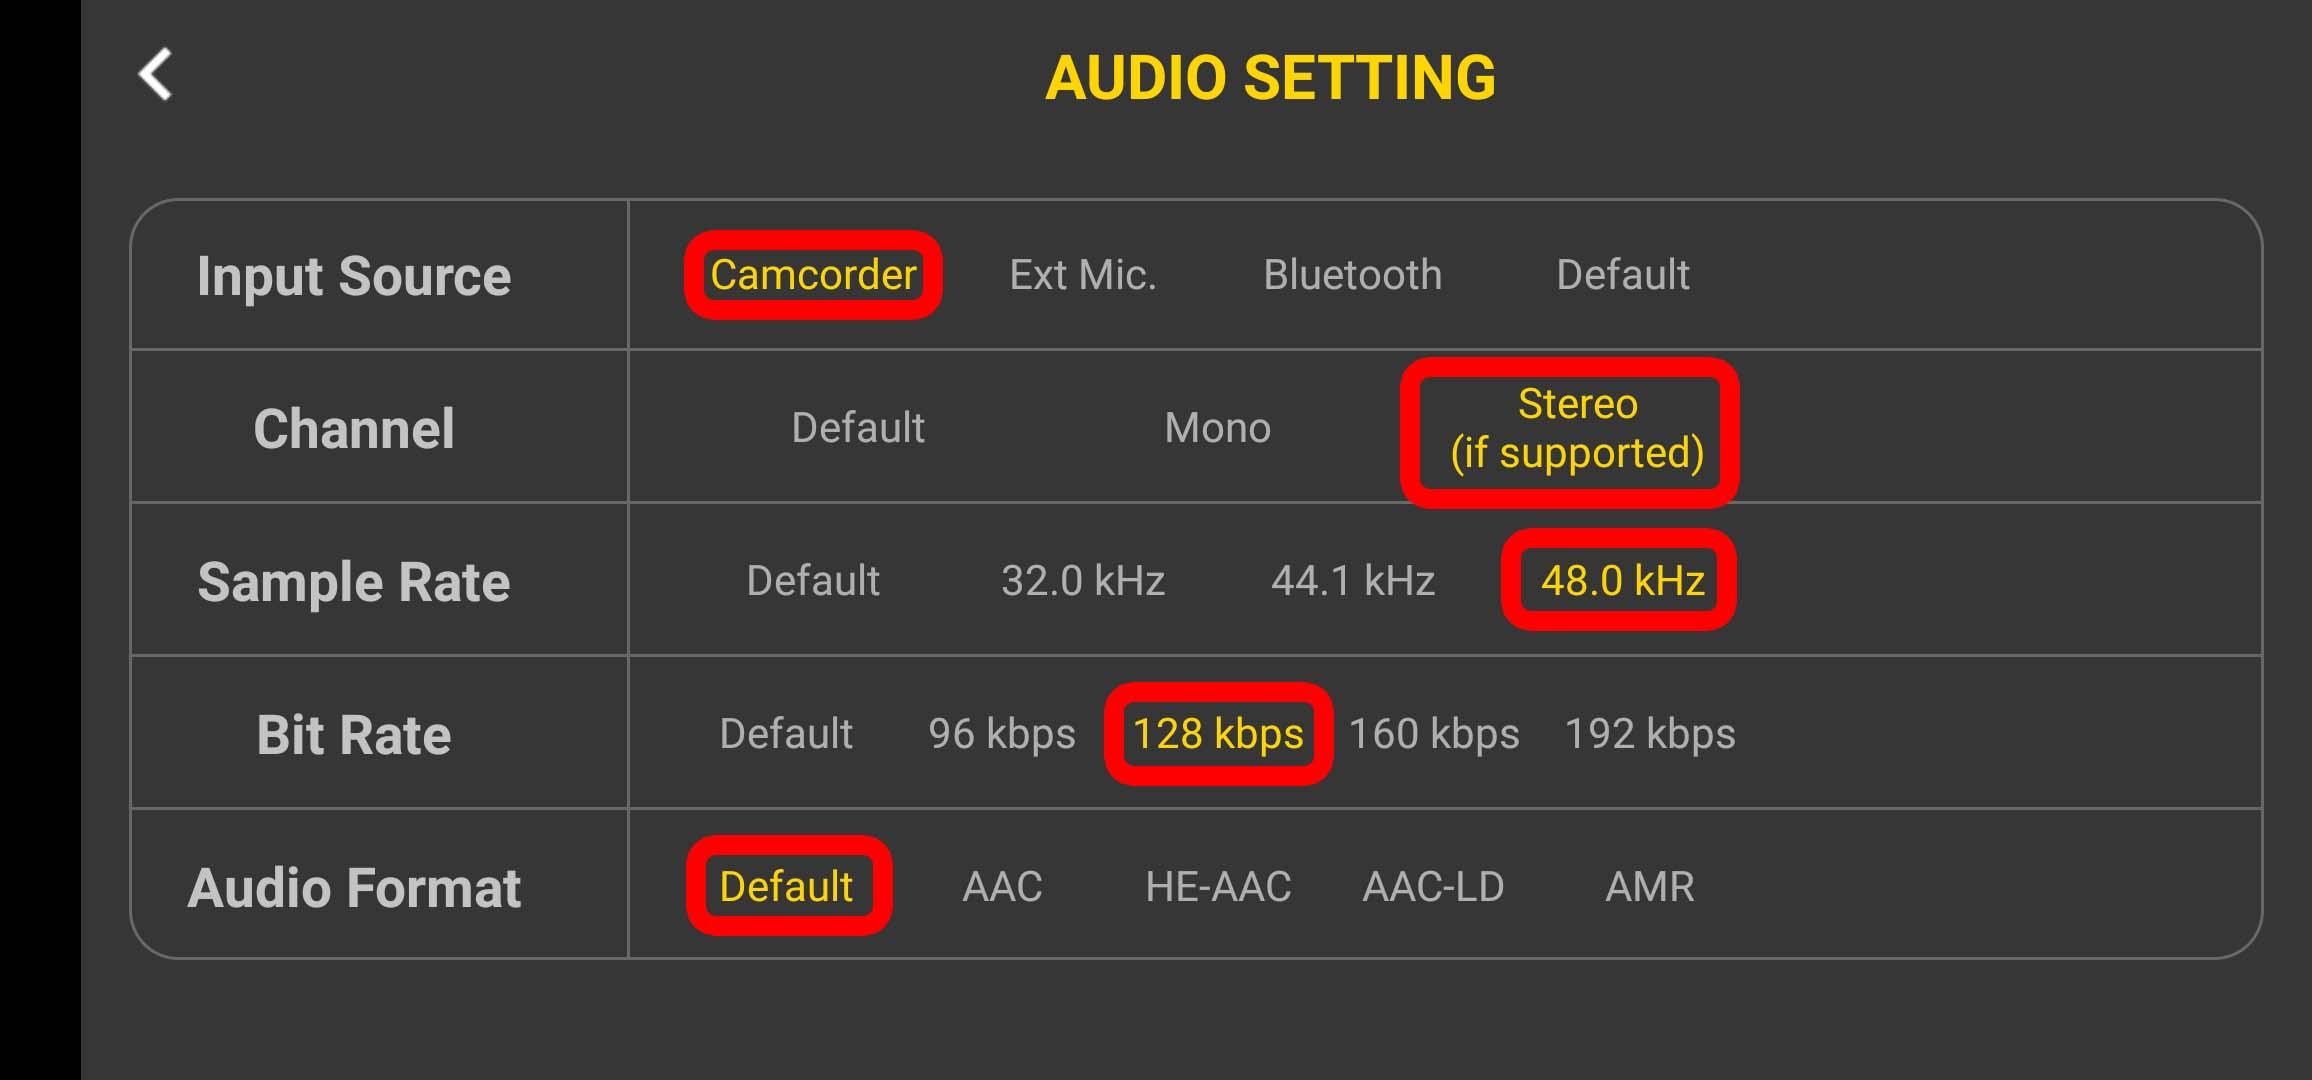 4k Camera Pro - Einstellungen bei Audio-Settings